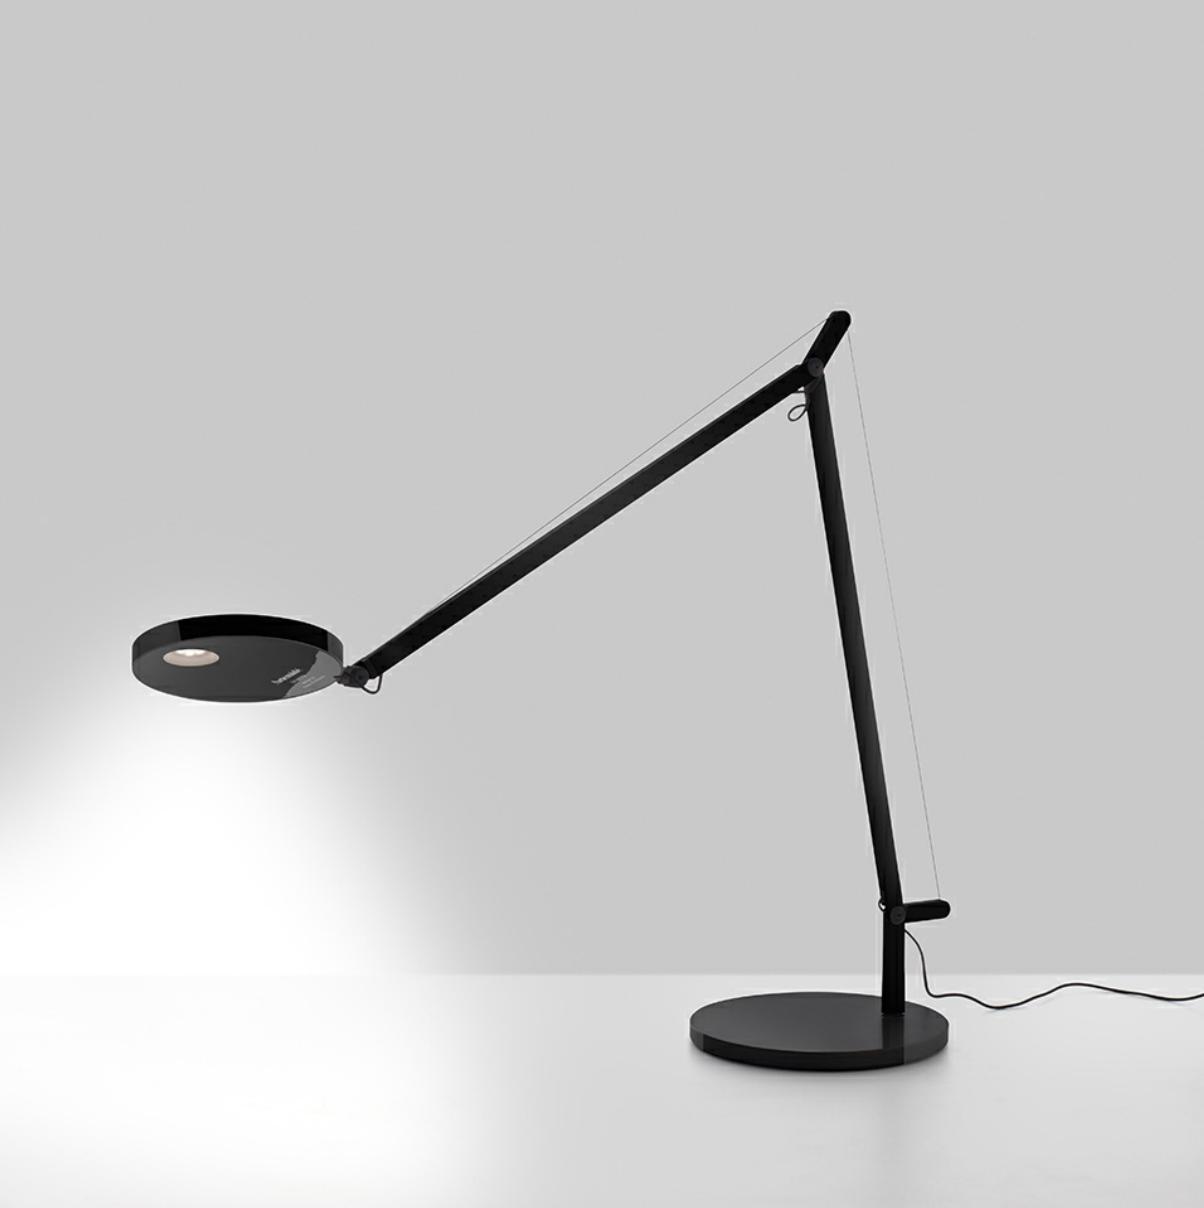 Demetra Lamp   Naoto Fukasawa for Artemide - 2013